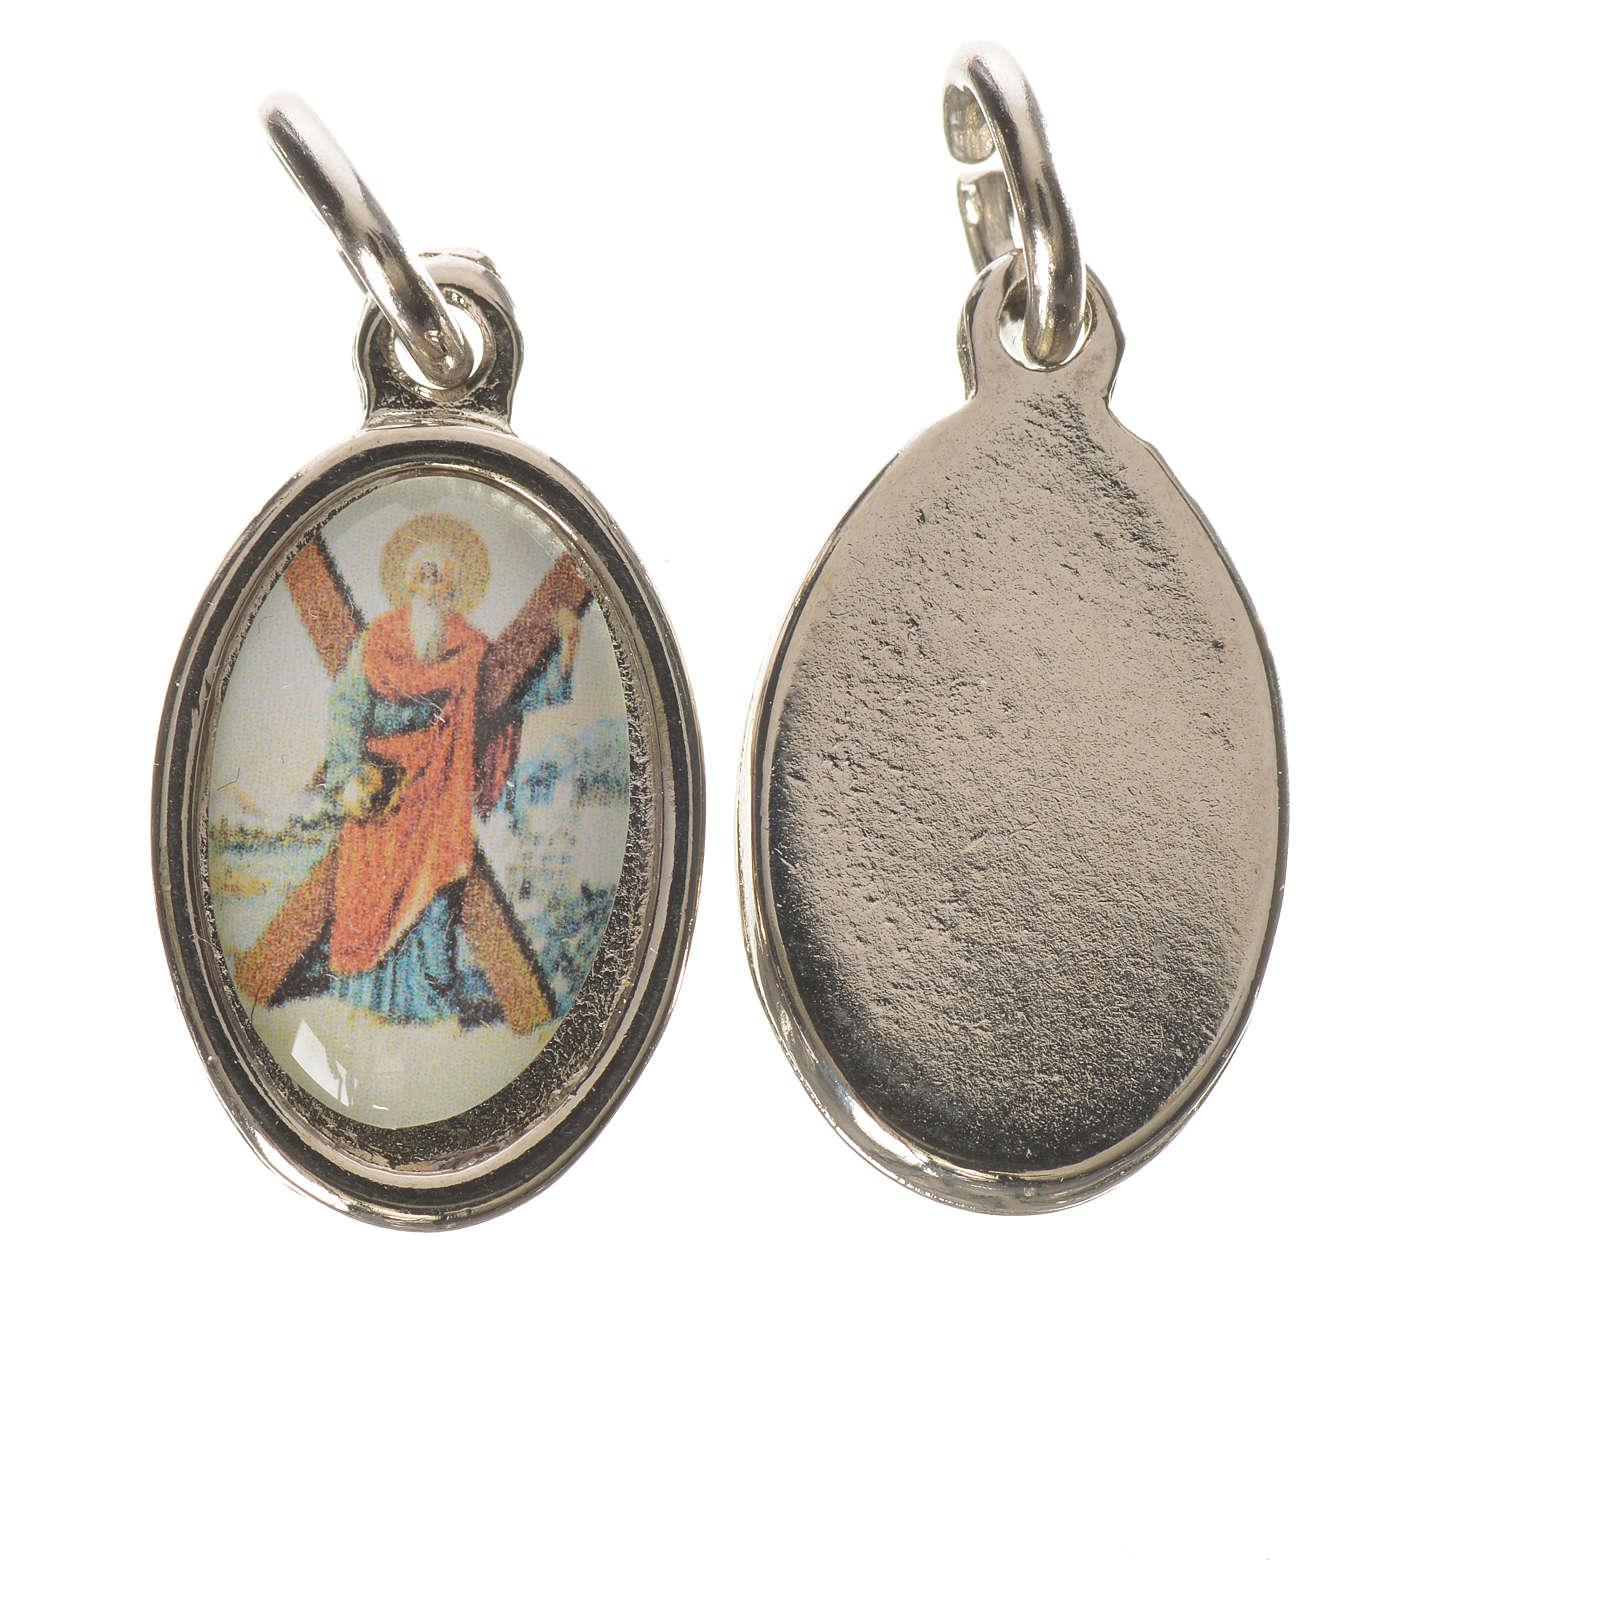 Saint Andrew medal in silver metal, 1.5cm 4